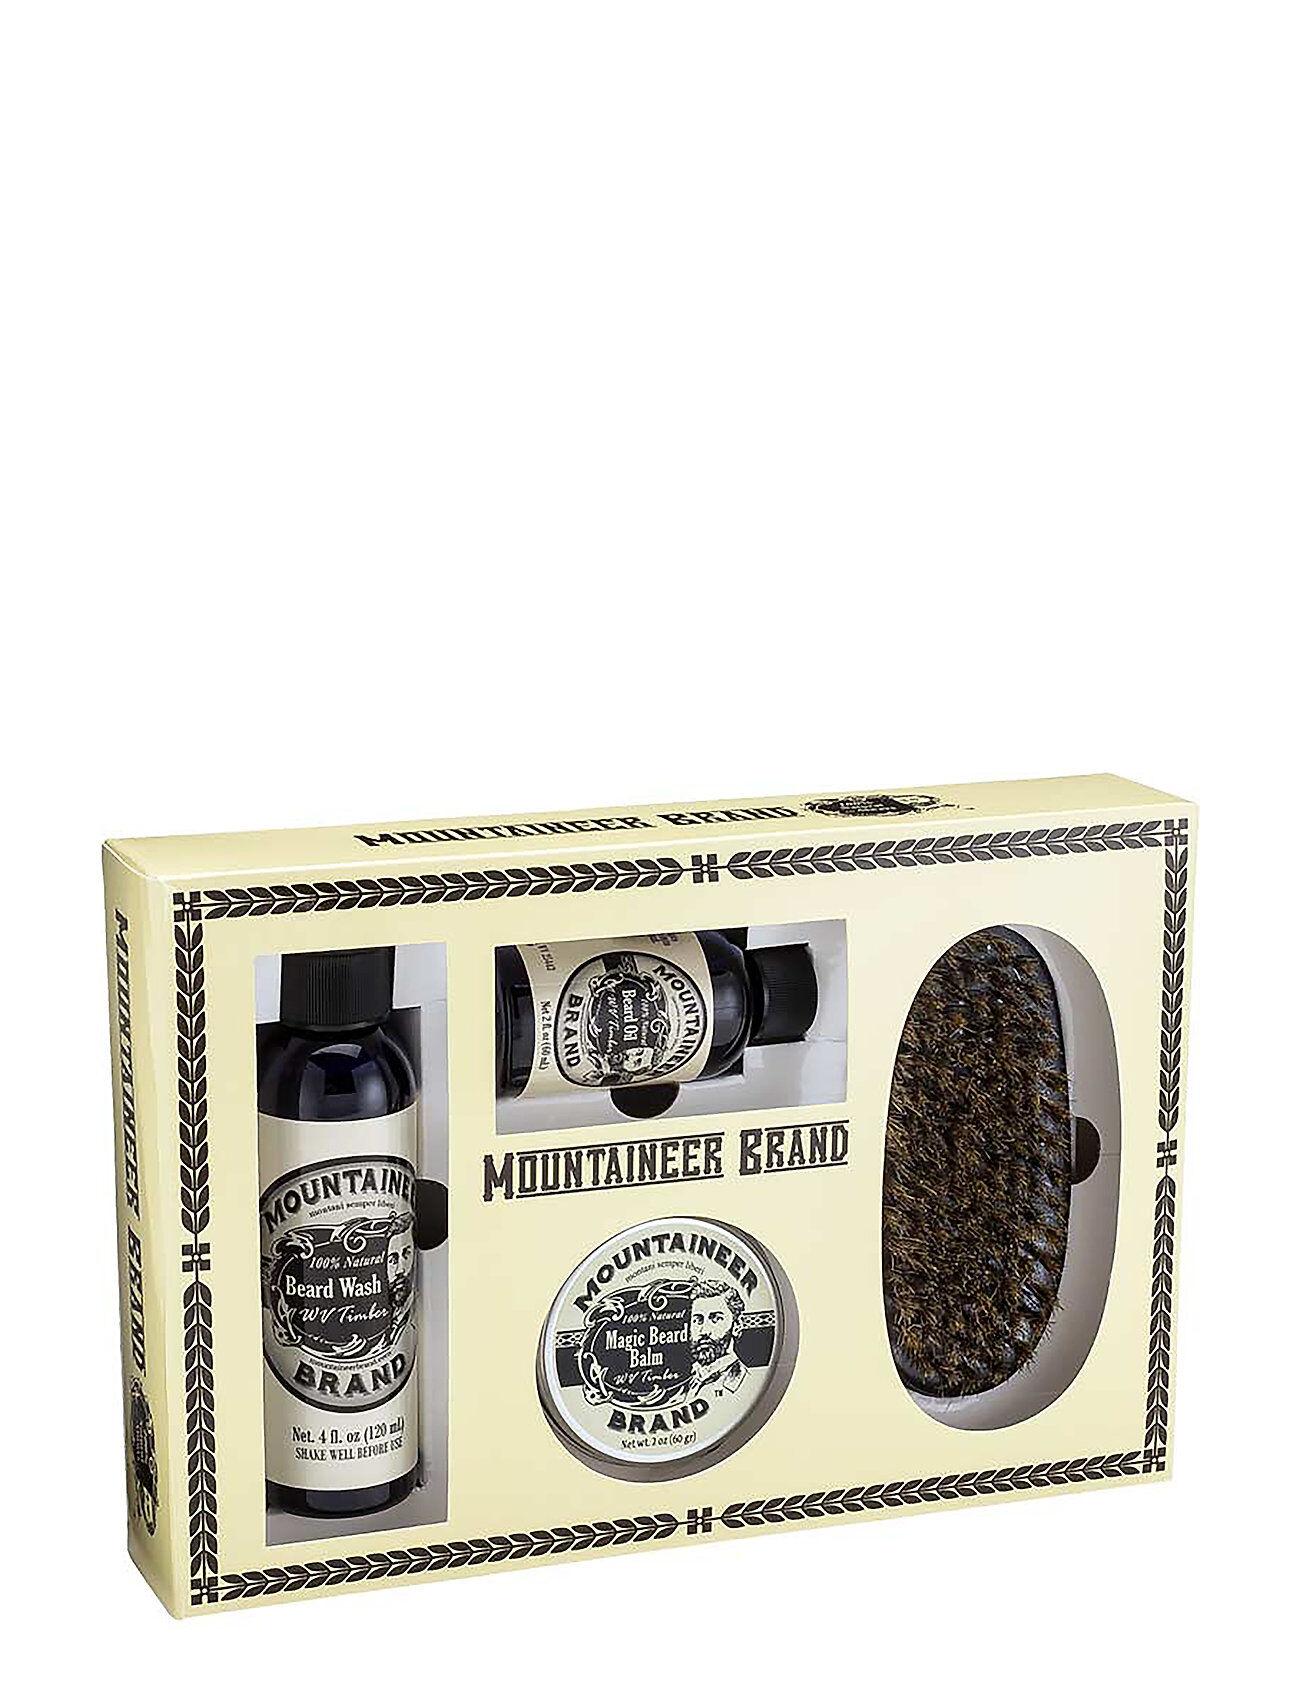 Mountaineer Brand 4 Piece Timber Gift Set